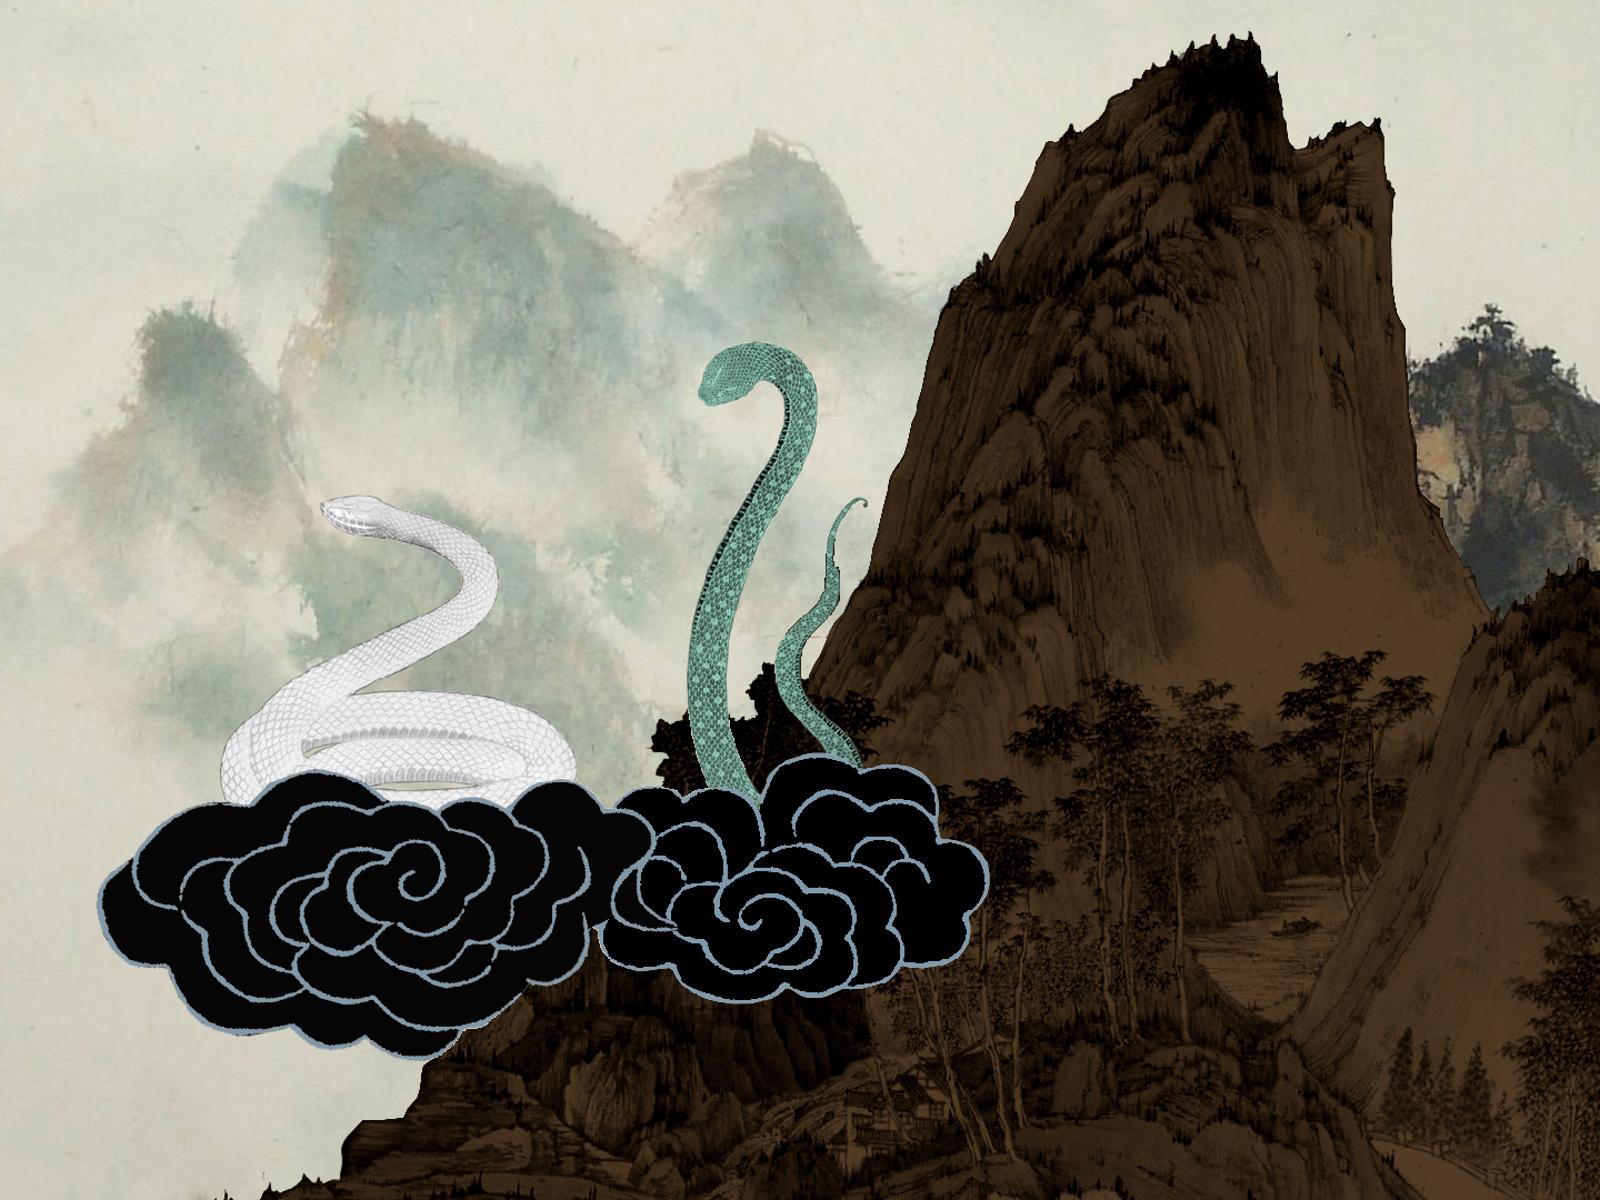 Two Snakes | video | dir. Krstin Li